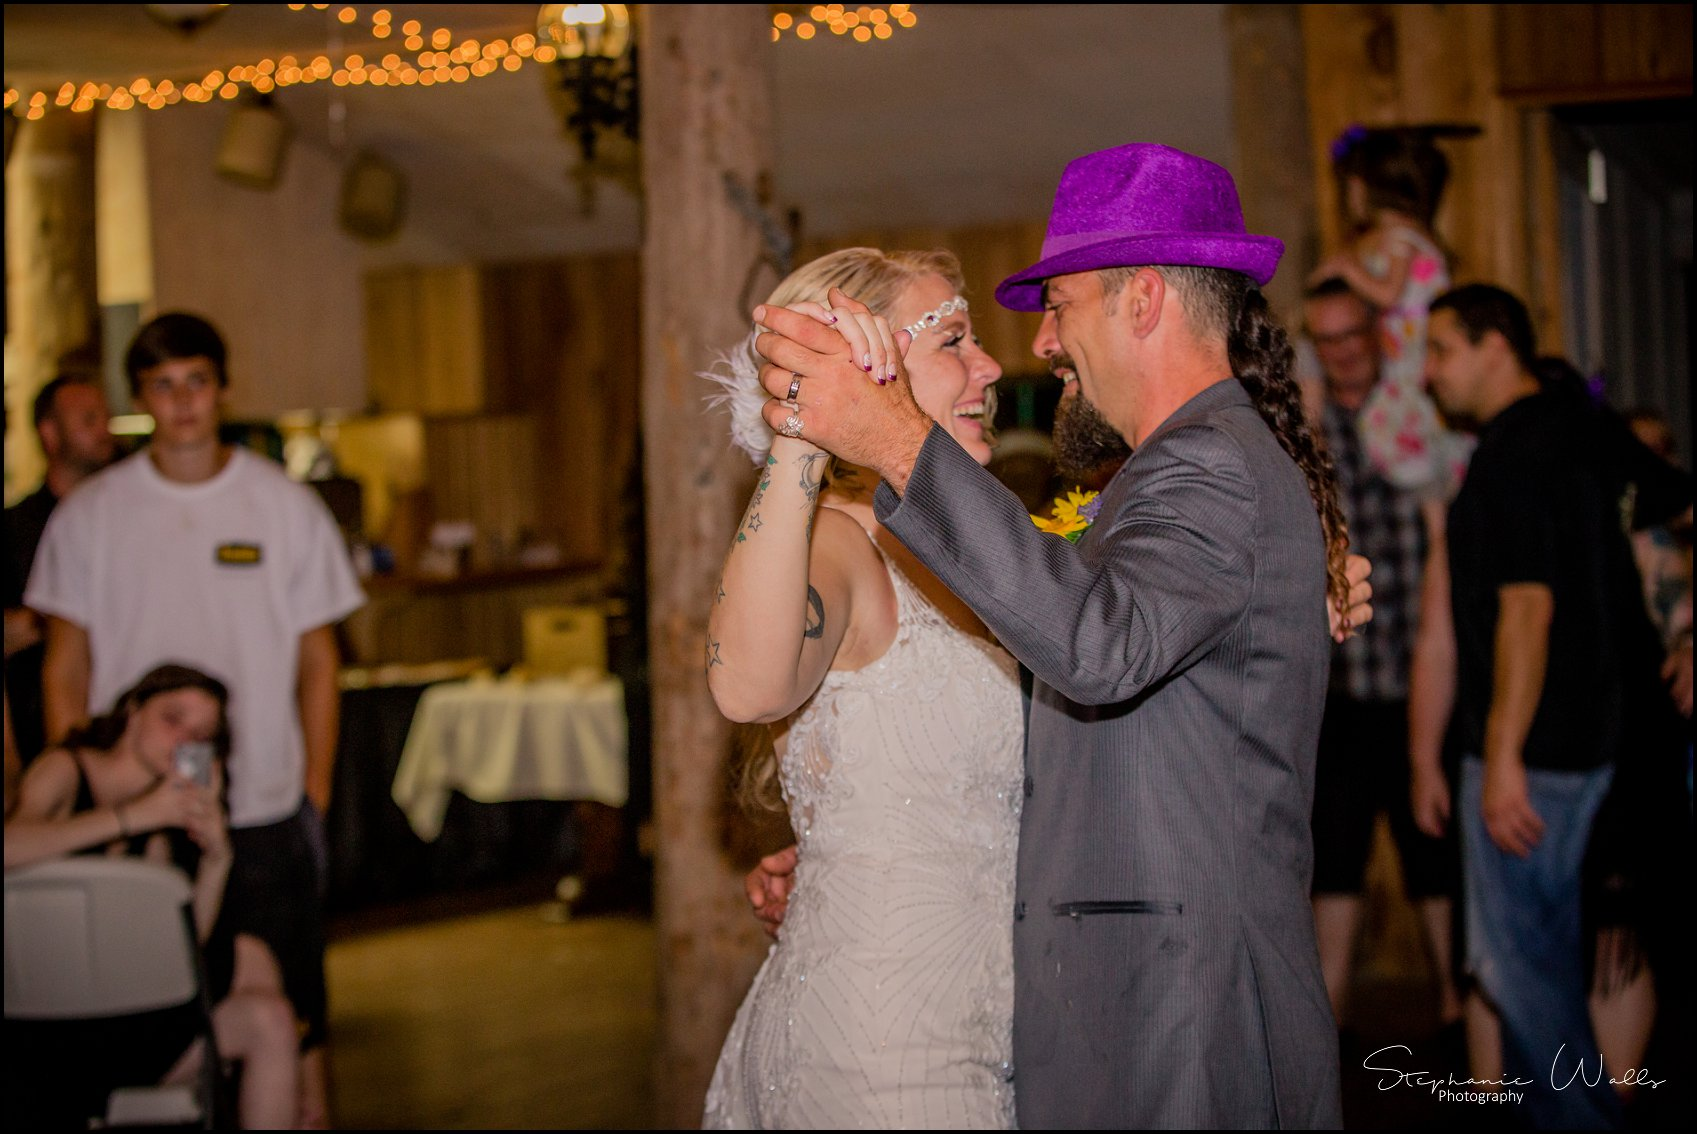 Everist Wedding 061 2 Patti & Bobbys | Troll Haven Castle & Bandy Farms | Sequim, Wa Wedding Photographer